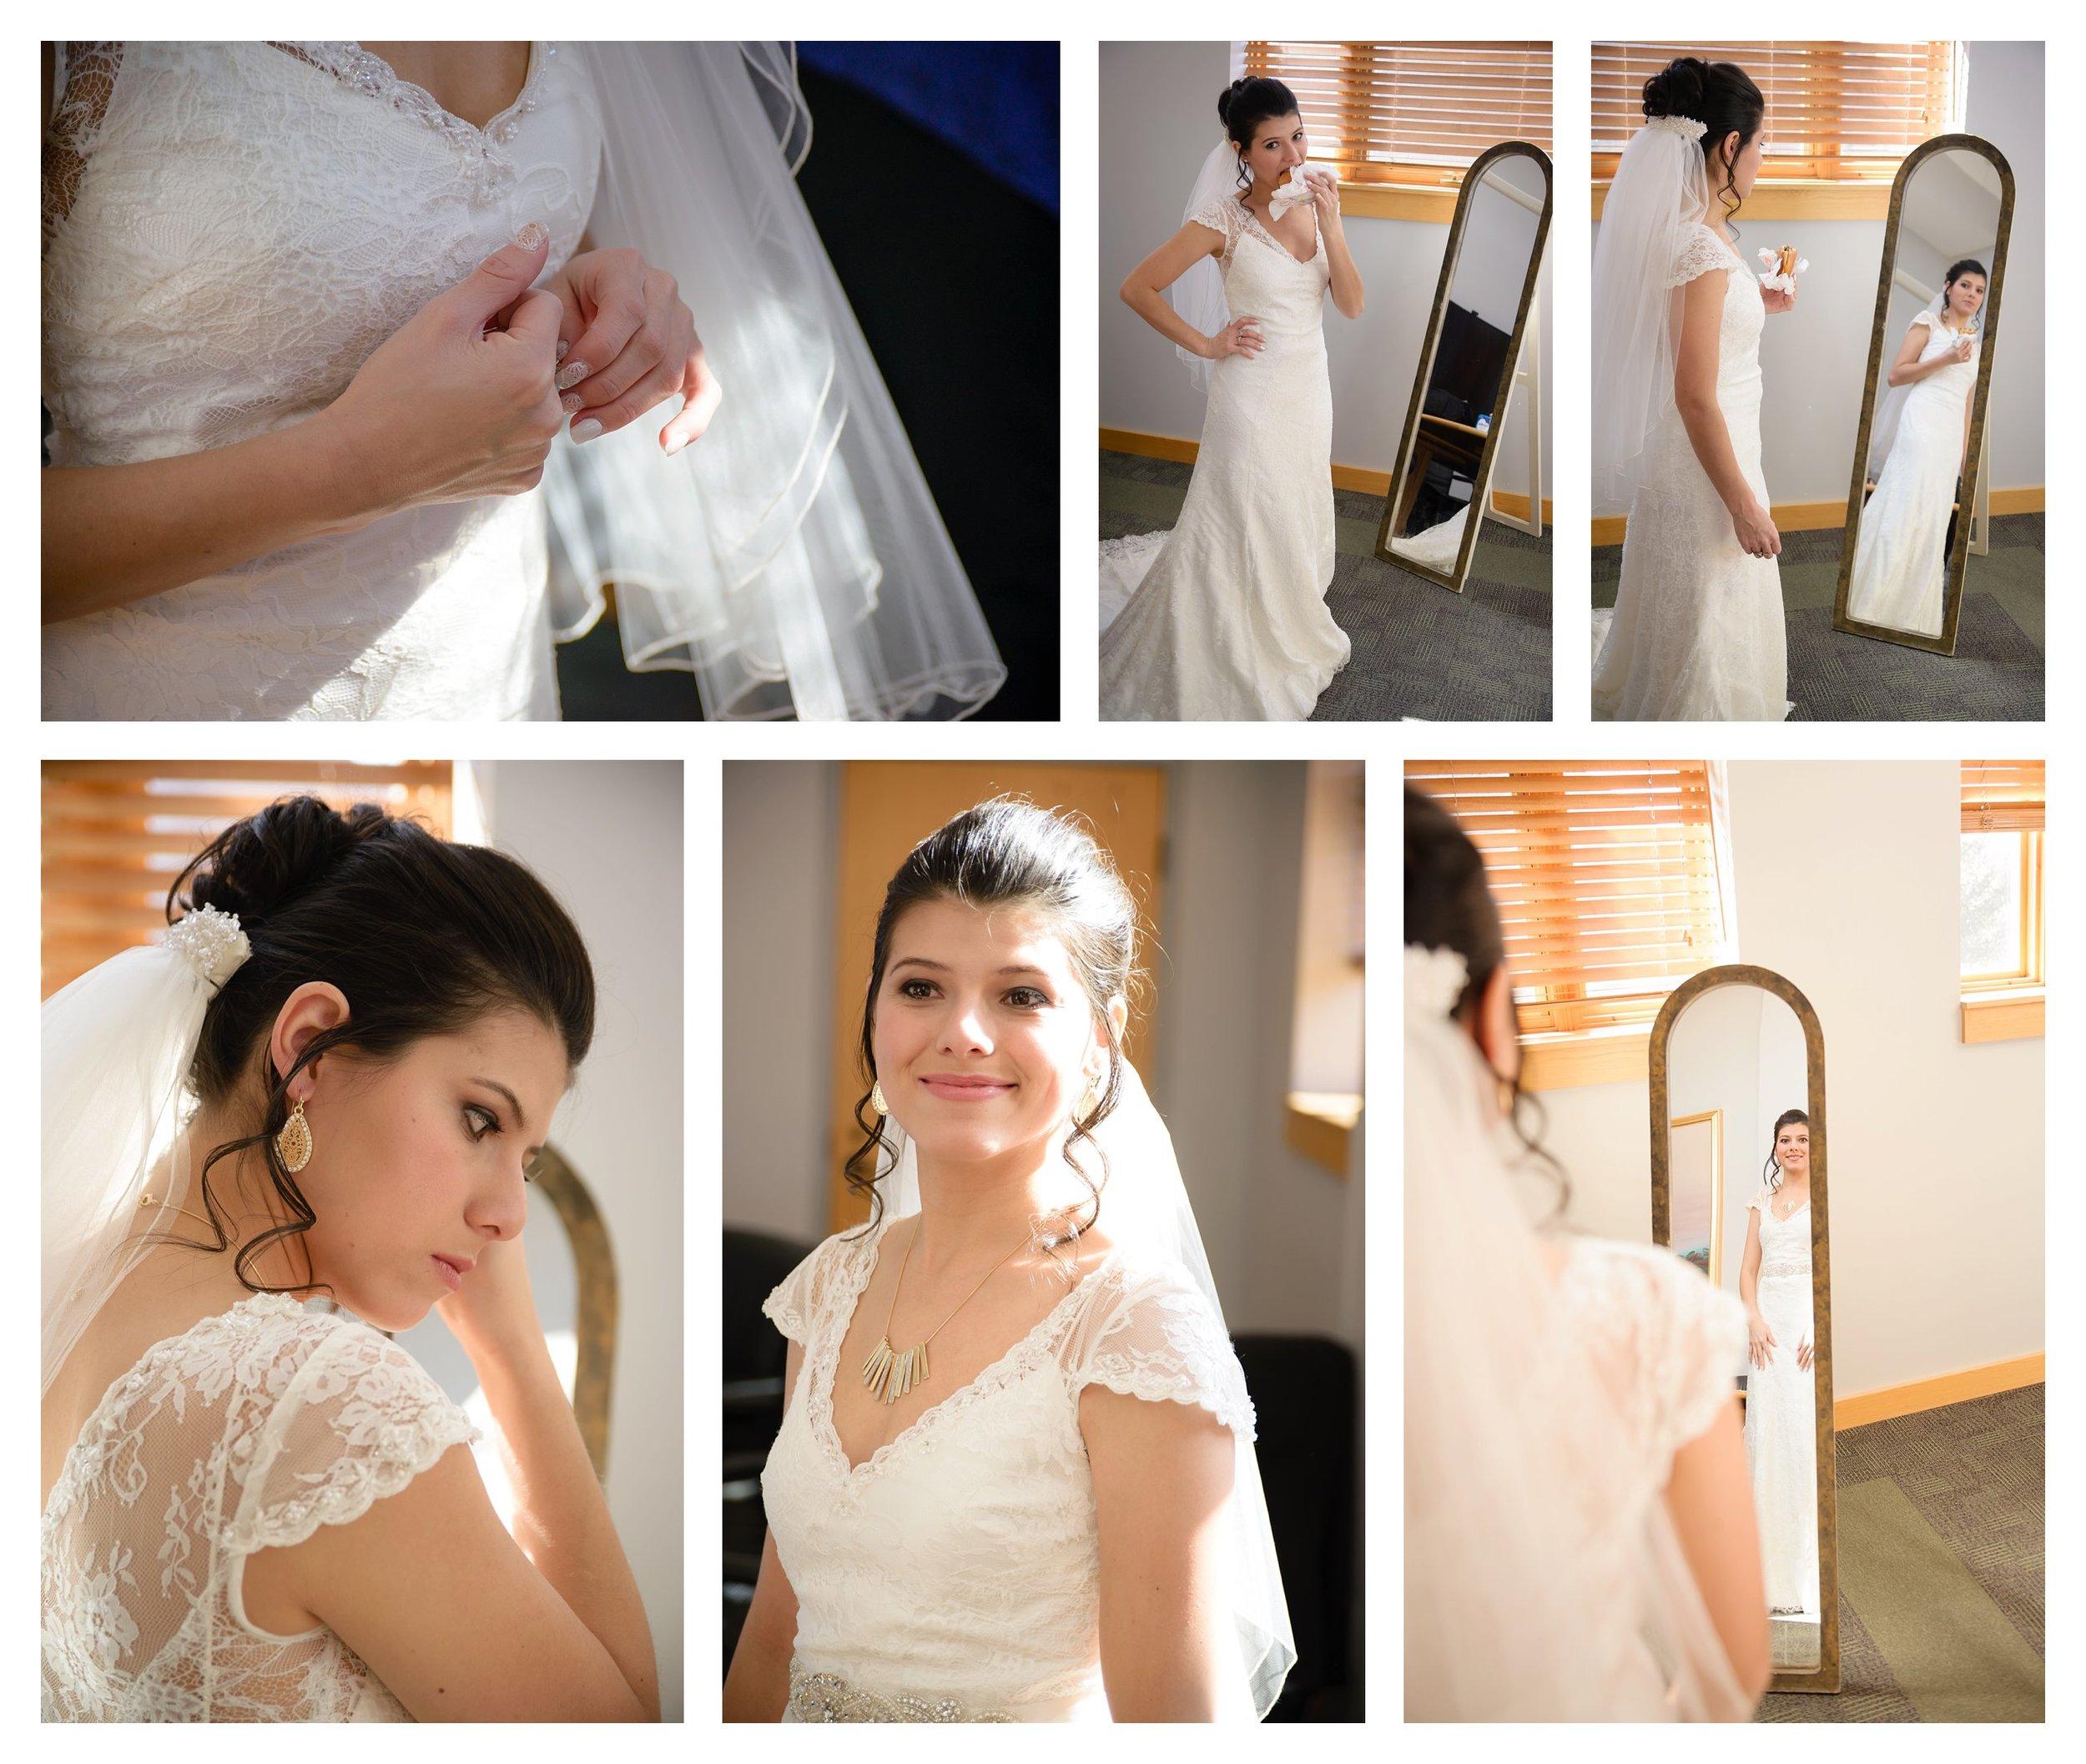 ashland wedding photographer iron river brule wisconsin ps 139 photography jen jensen_0147.jpg